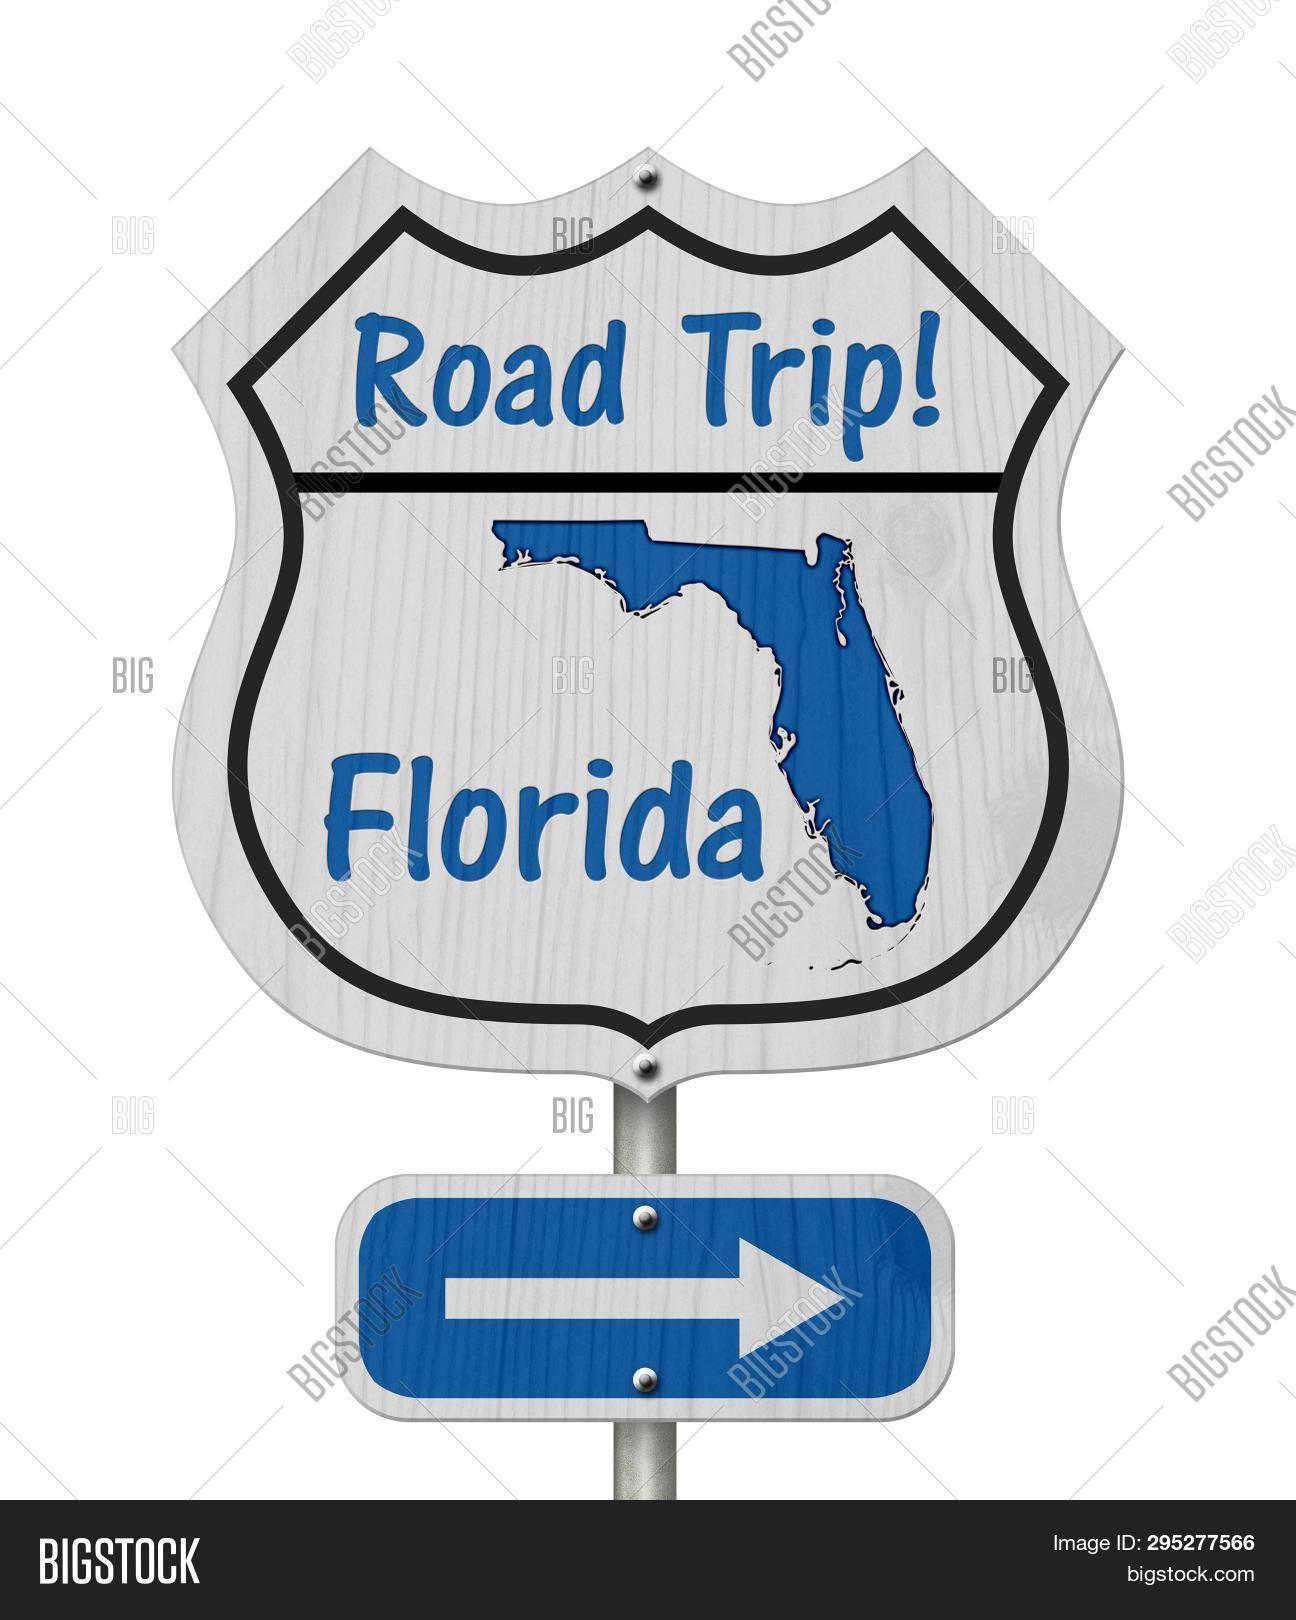 Free Florida Road Map.Florida Road Trip Image Photo Free Trial Bigstock